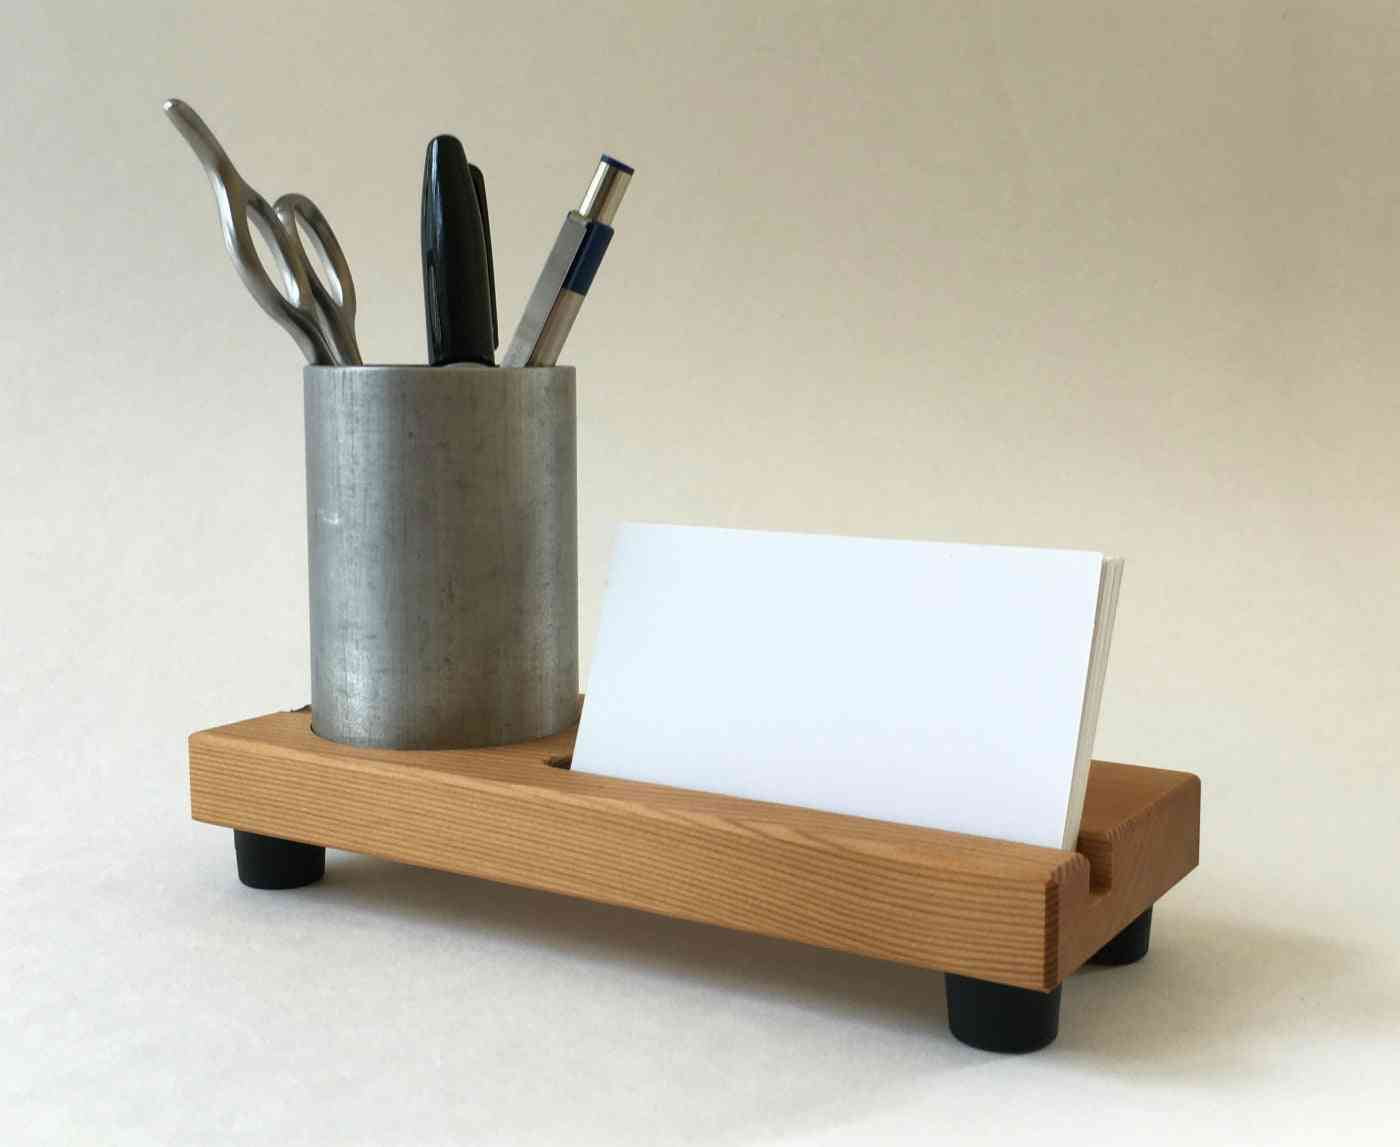 Pencil,pen & Business Card Holder